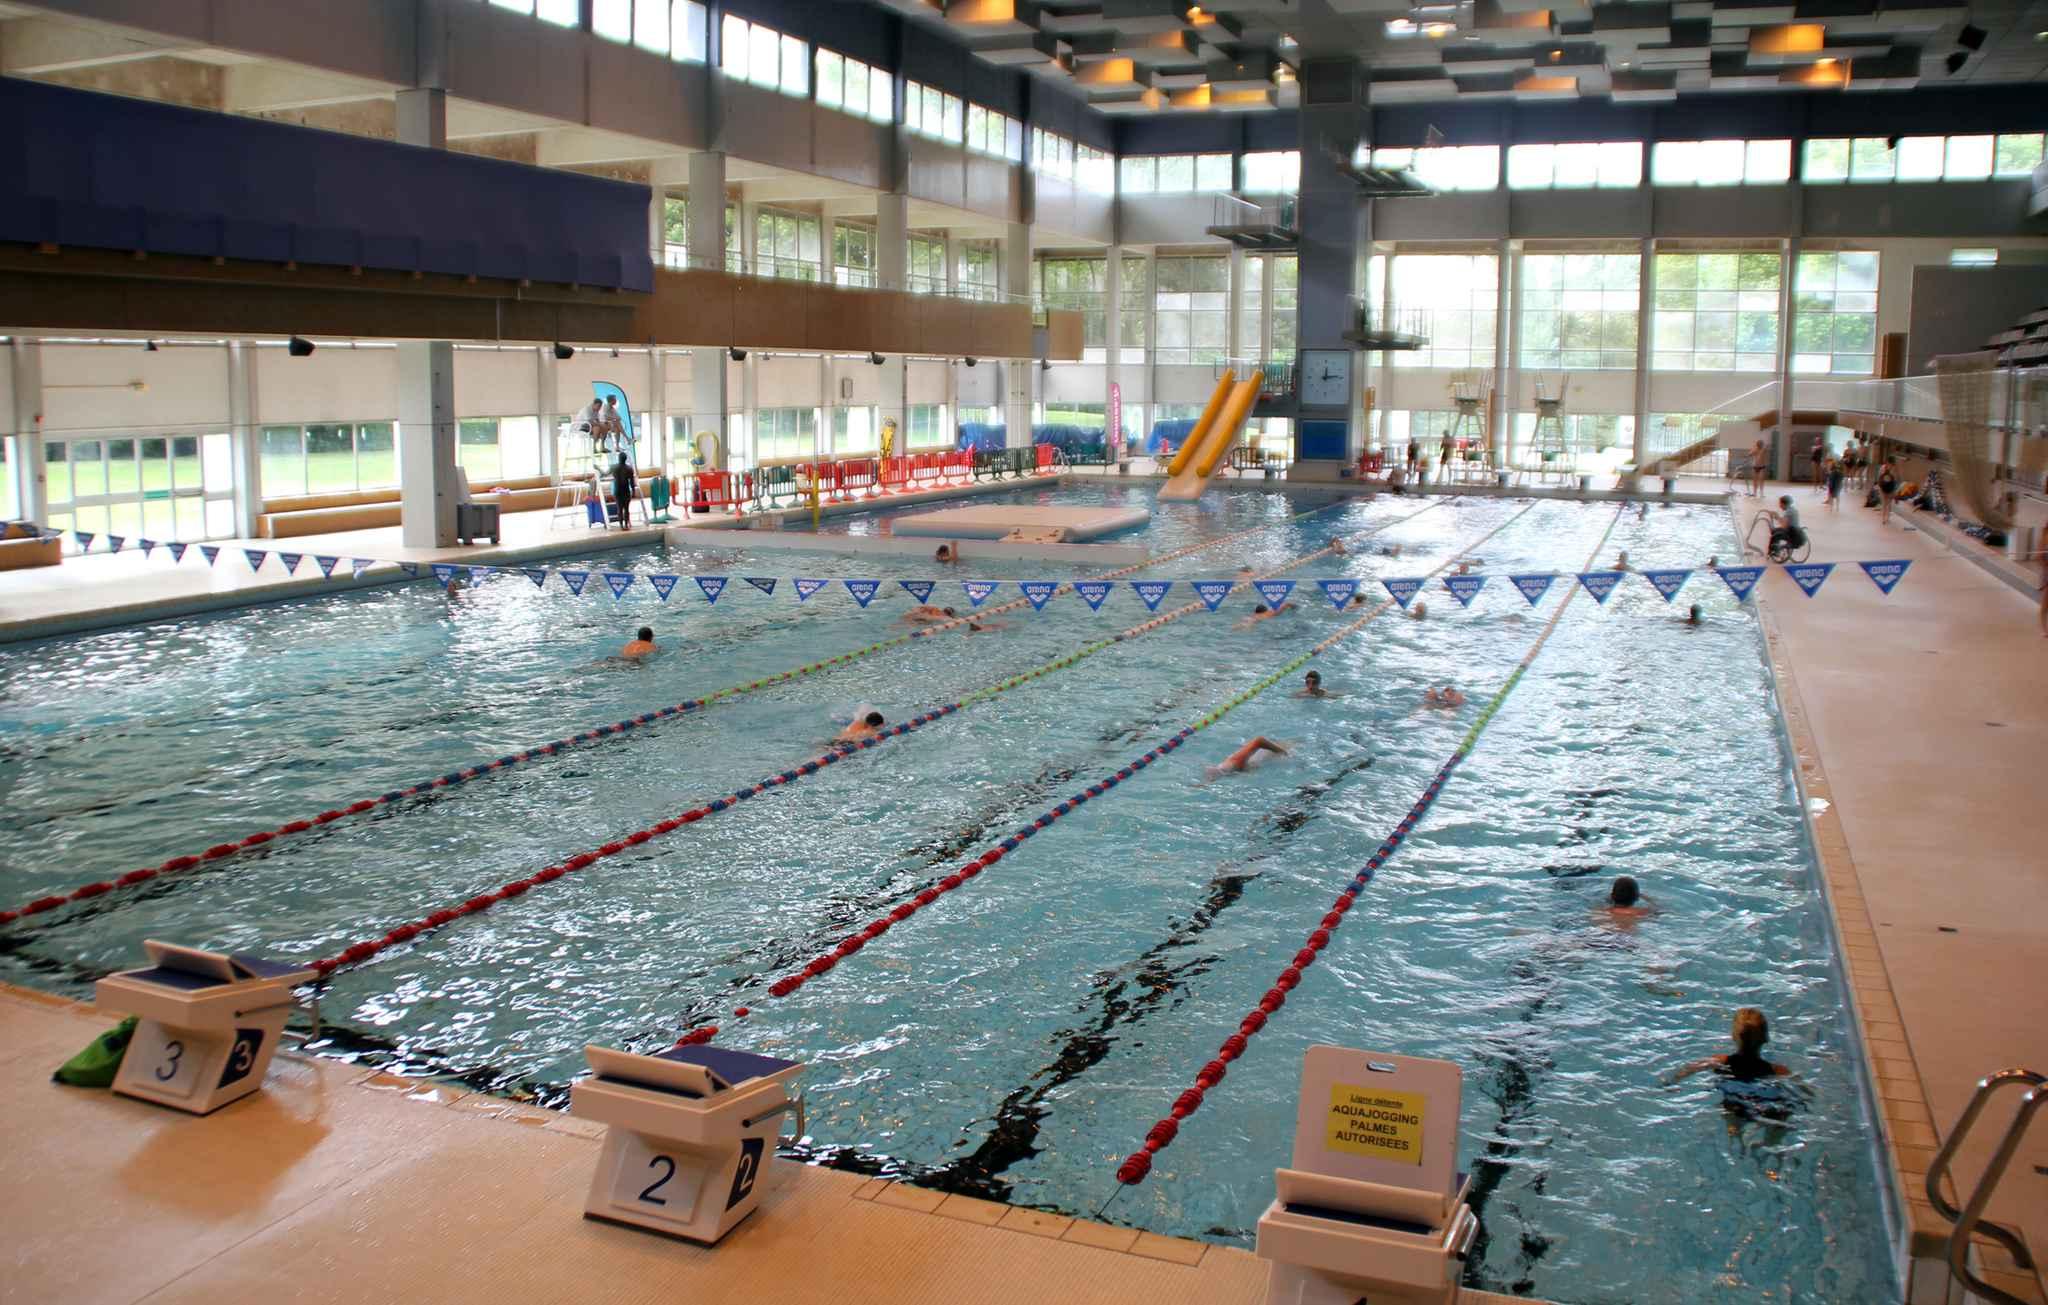 2048×1536-Fit_Piscine-Brequigny-Rennes – Rennes Triathlon dedans Piscine Brequigny